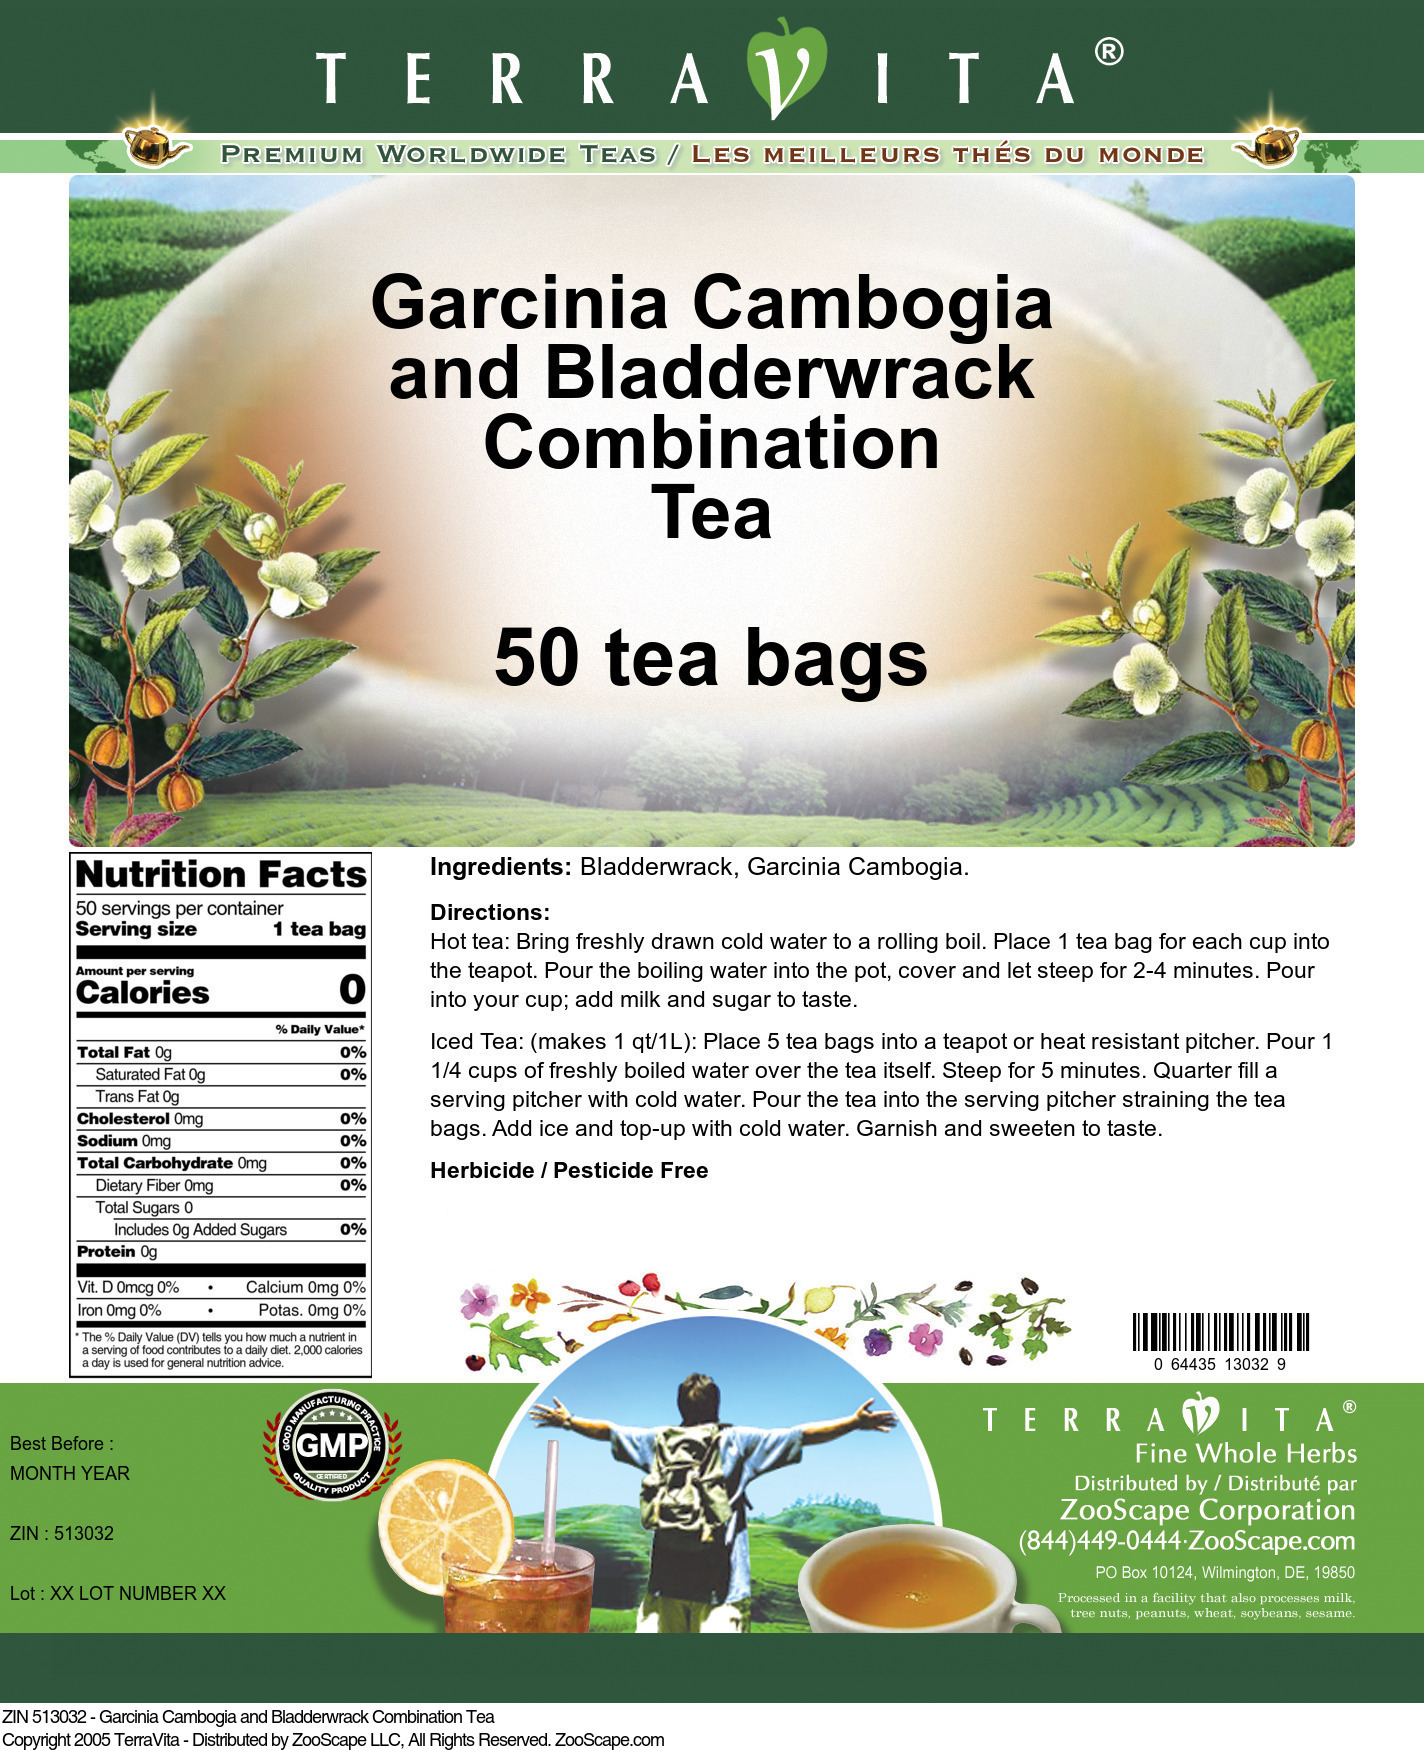 Garcinia Cambogia and Bladderwrack Combination Tea